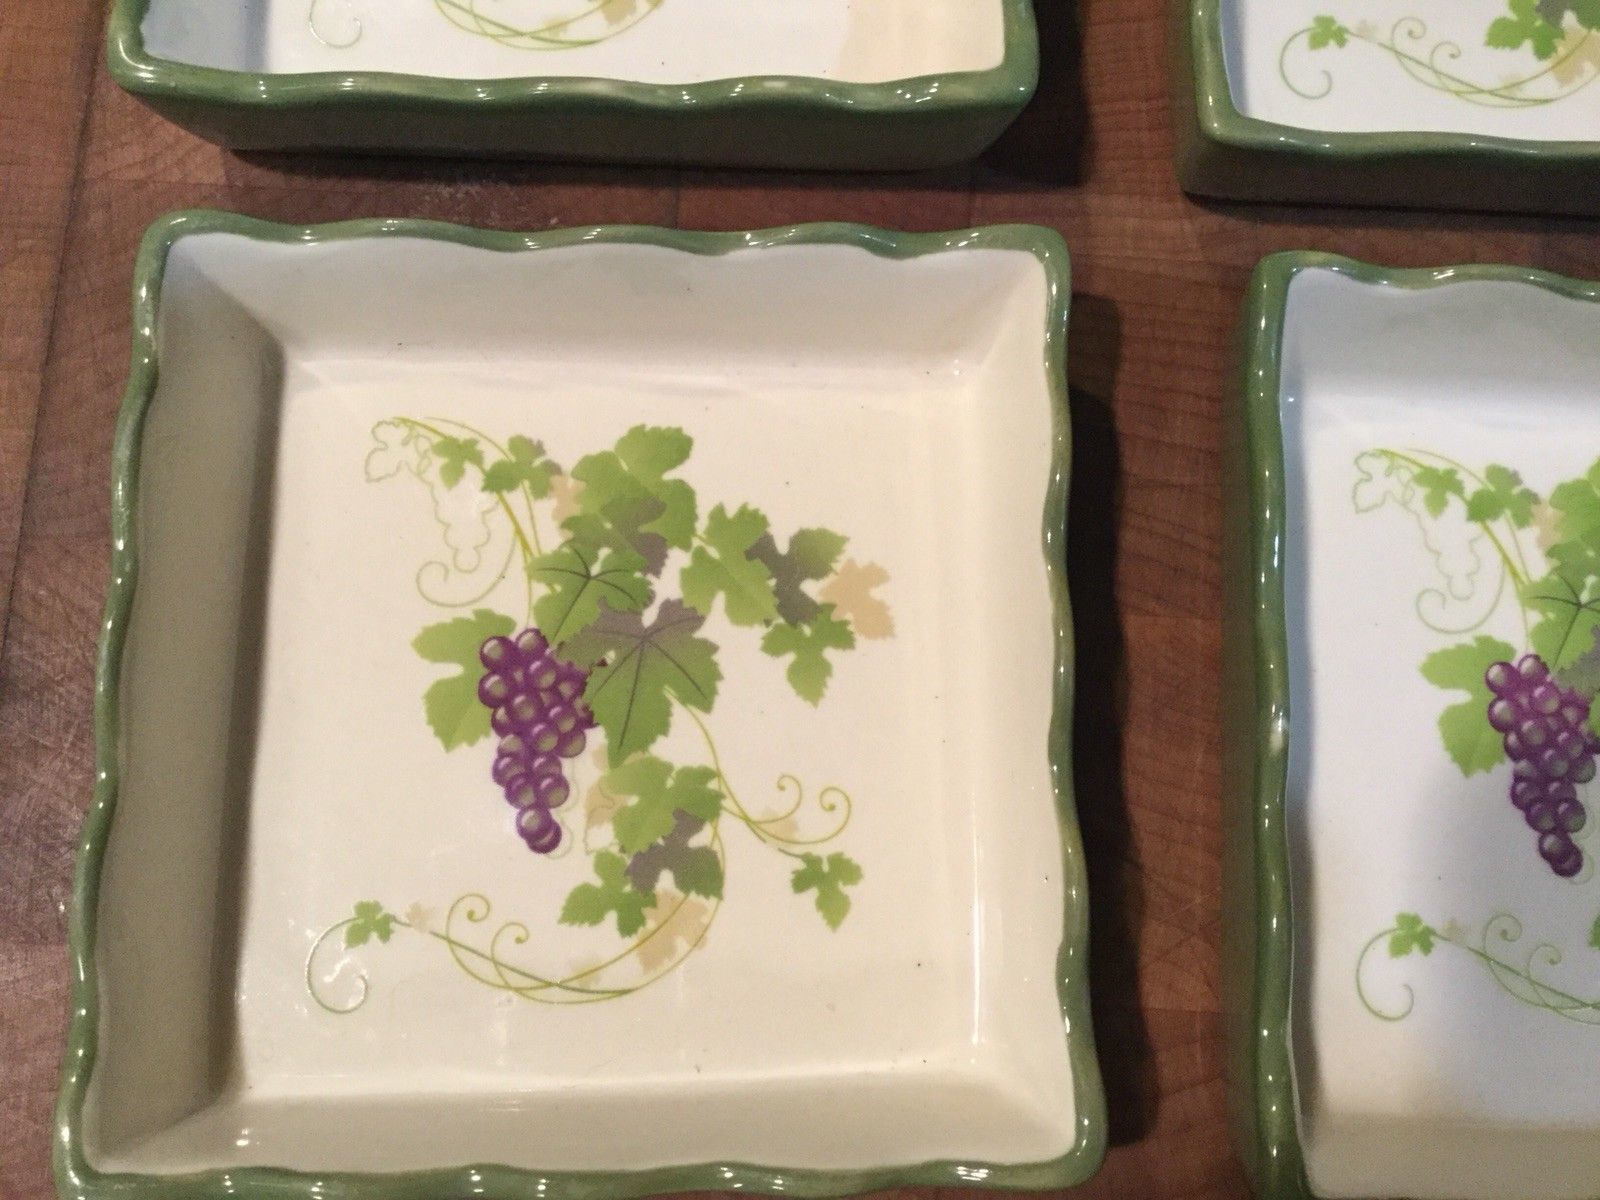 California Pantry Classic Ceramics and 35 similar items